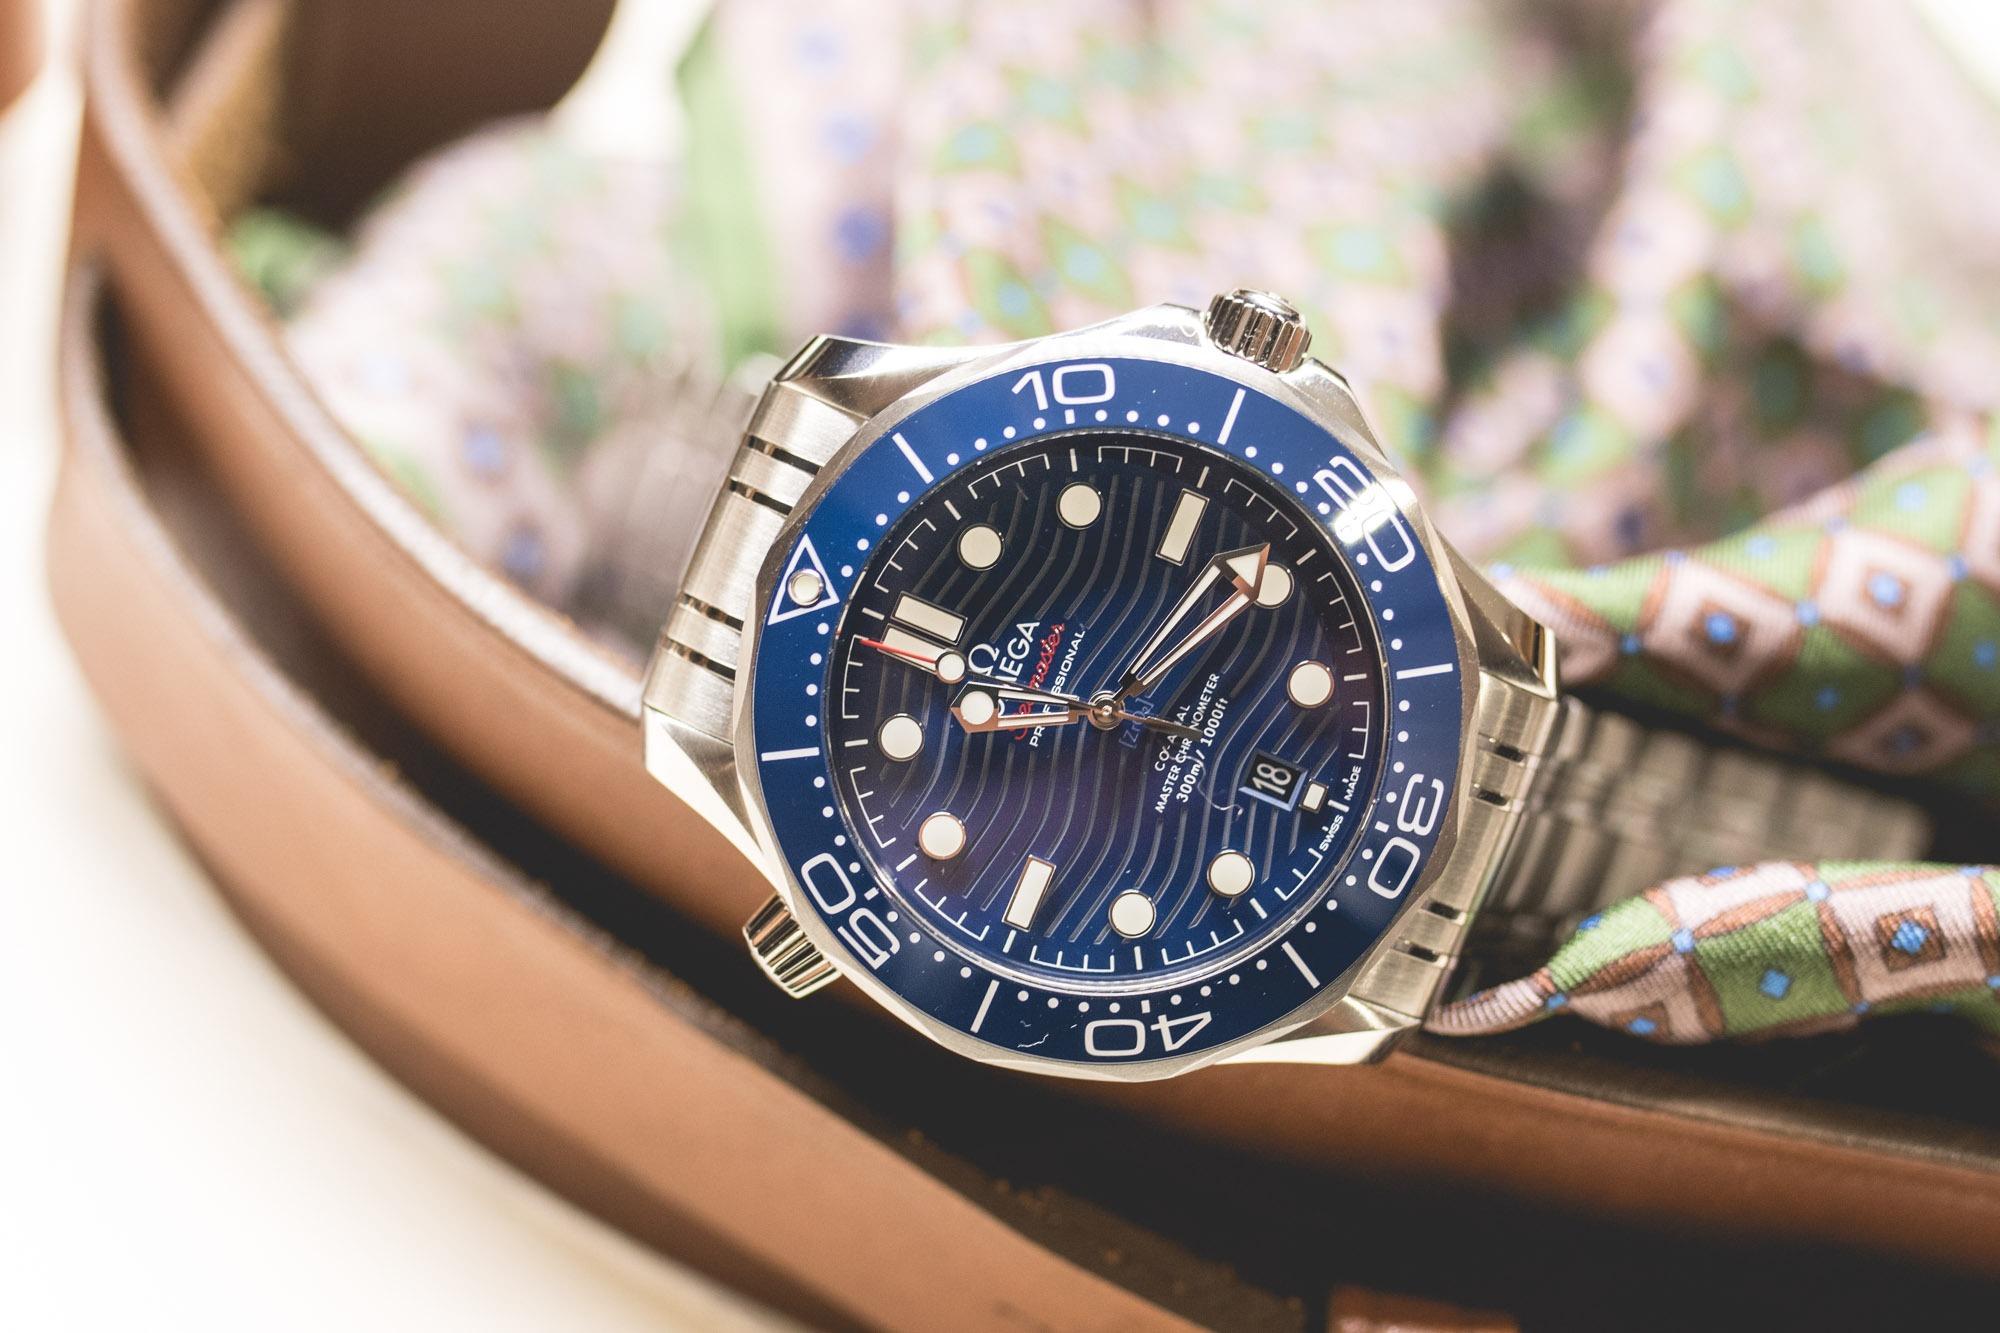 Baselworld 2018 - Omega Seamaster Diver 300M - Focus